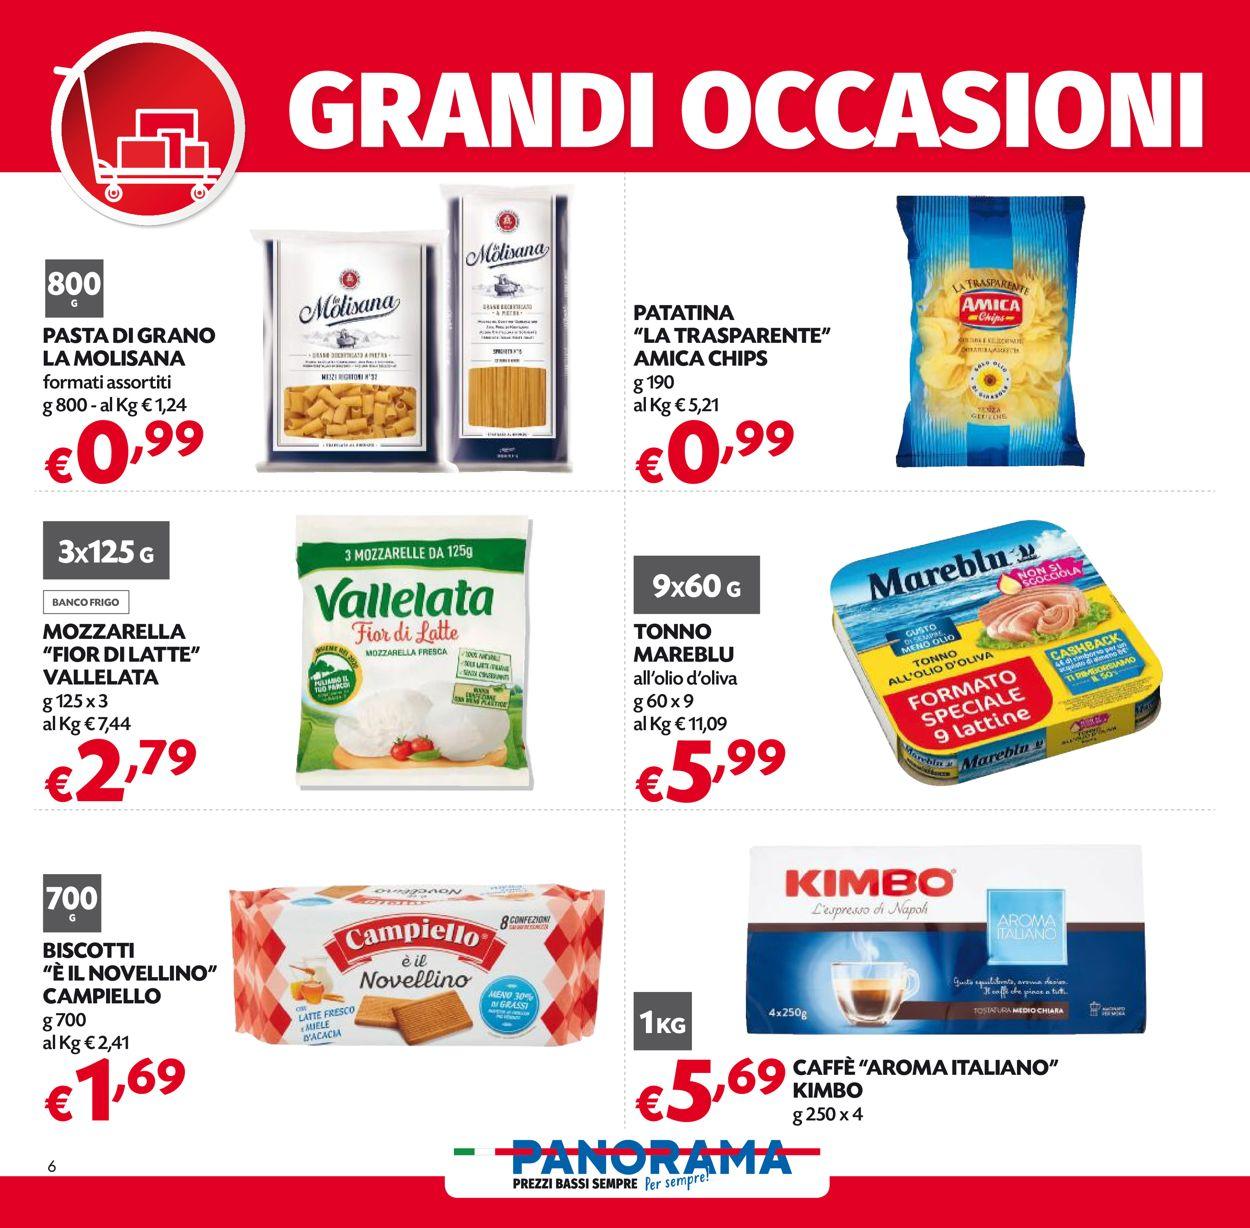 Volantino Pam Panorama - Offerte 06/04-21/04/2021 (Pagina 6)